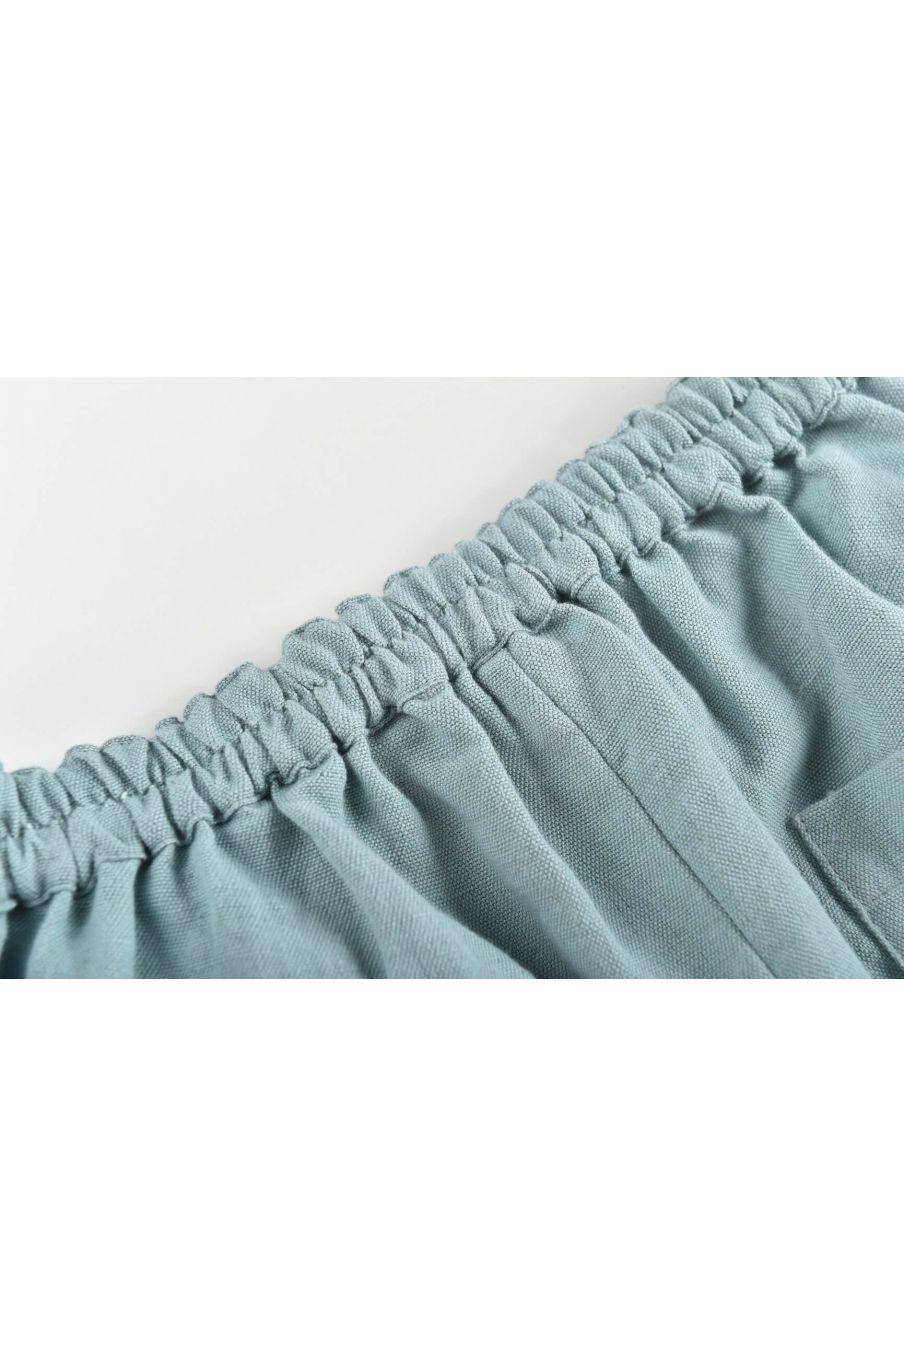 boheme chic vintage short garcon aliki vintage blue